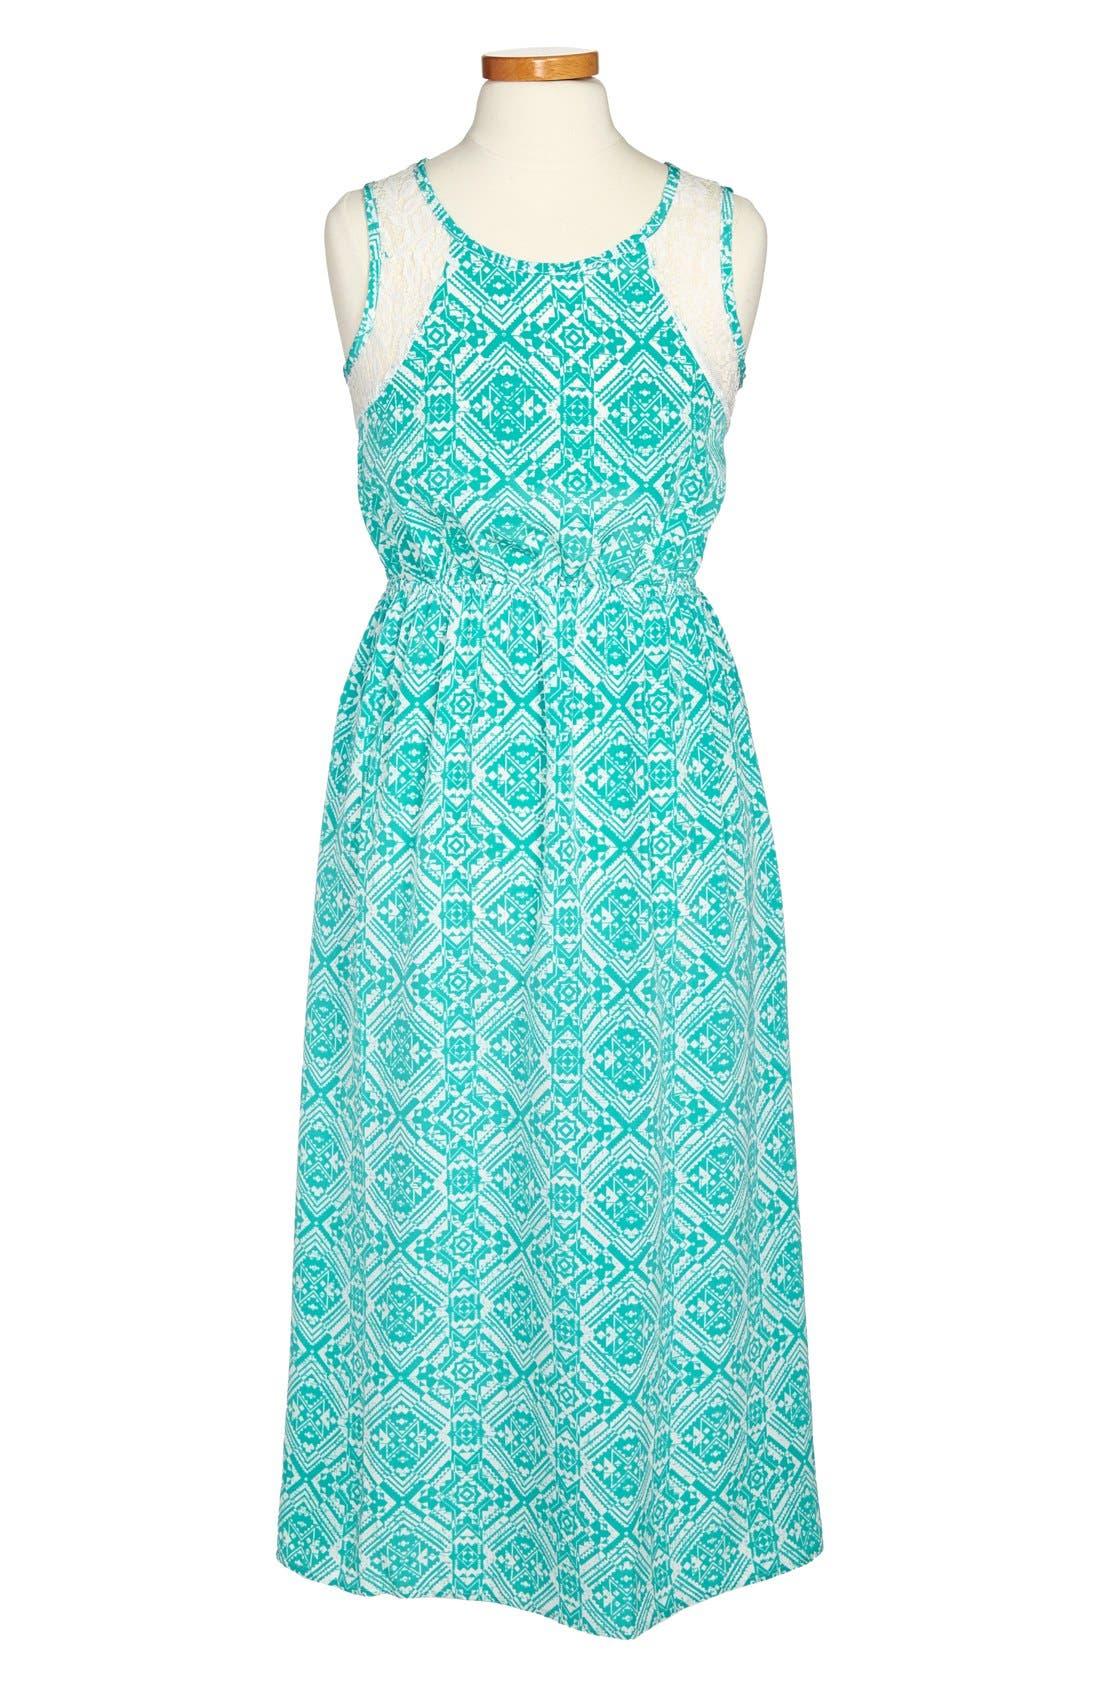 Alternate Image 1 Selected - Soprano Sleeveless Maxi Dress (Big Girls)